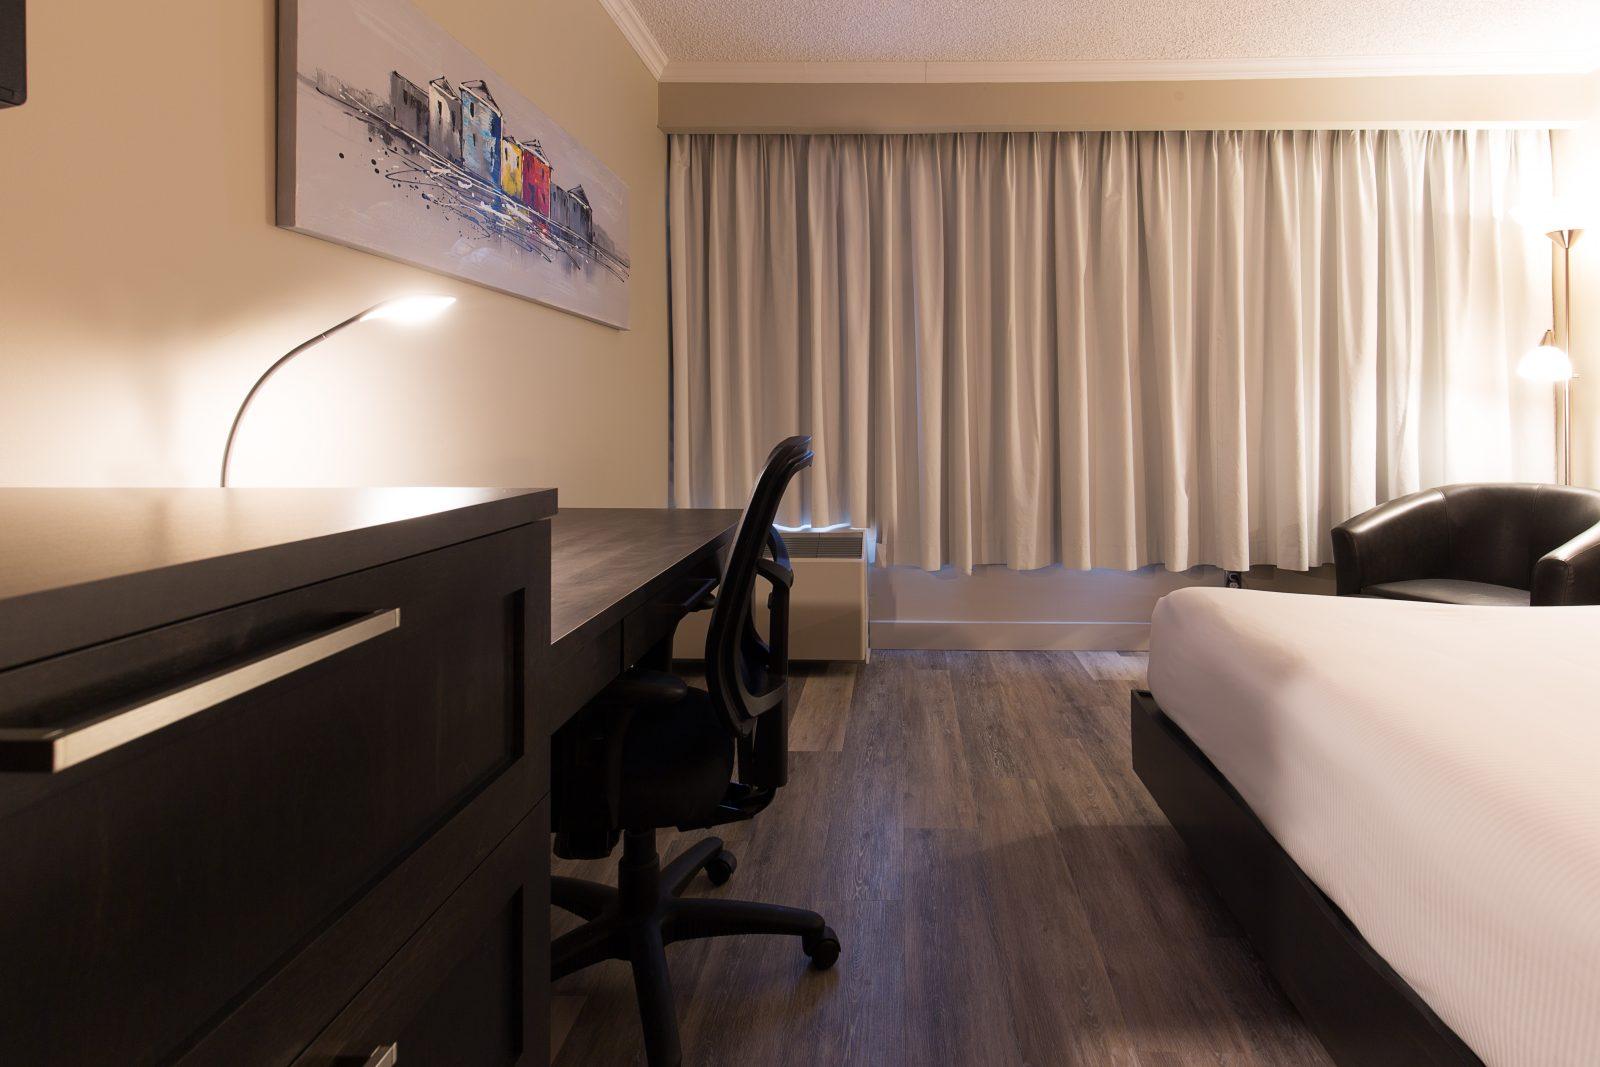 https://www.hoteluniversel.com/wp-content/uploads/2014/09/2Q7A3311-1600x1067.jpg